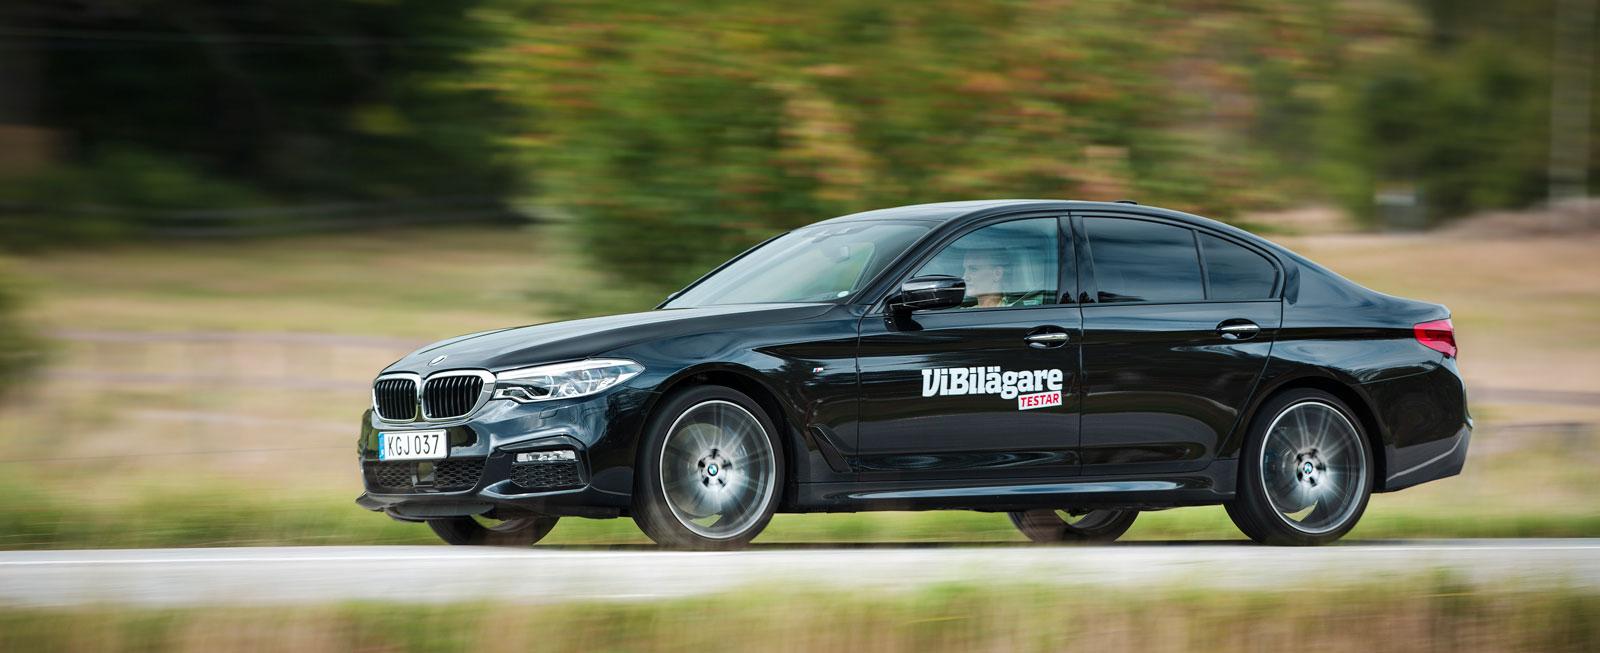 Test: Audi A6, BMW 5-serie, Volvo S90 (2018)